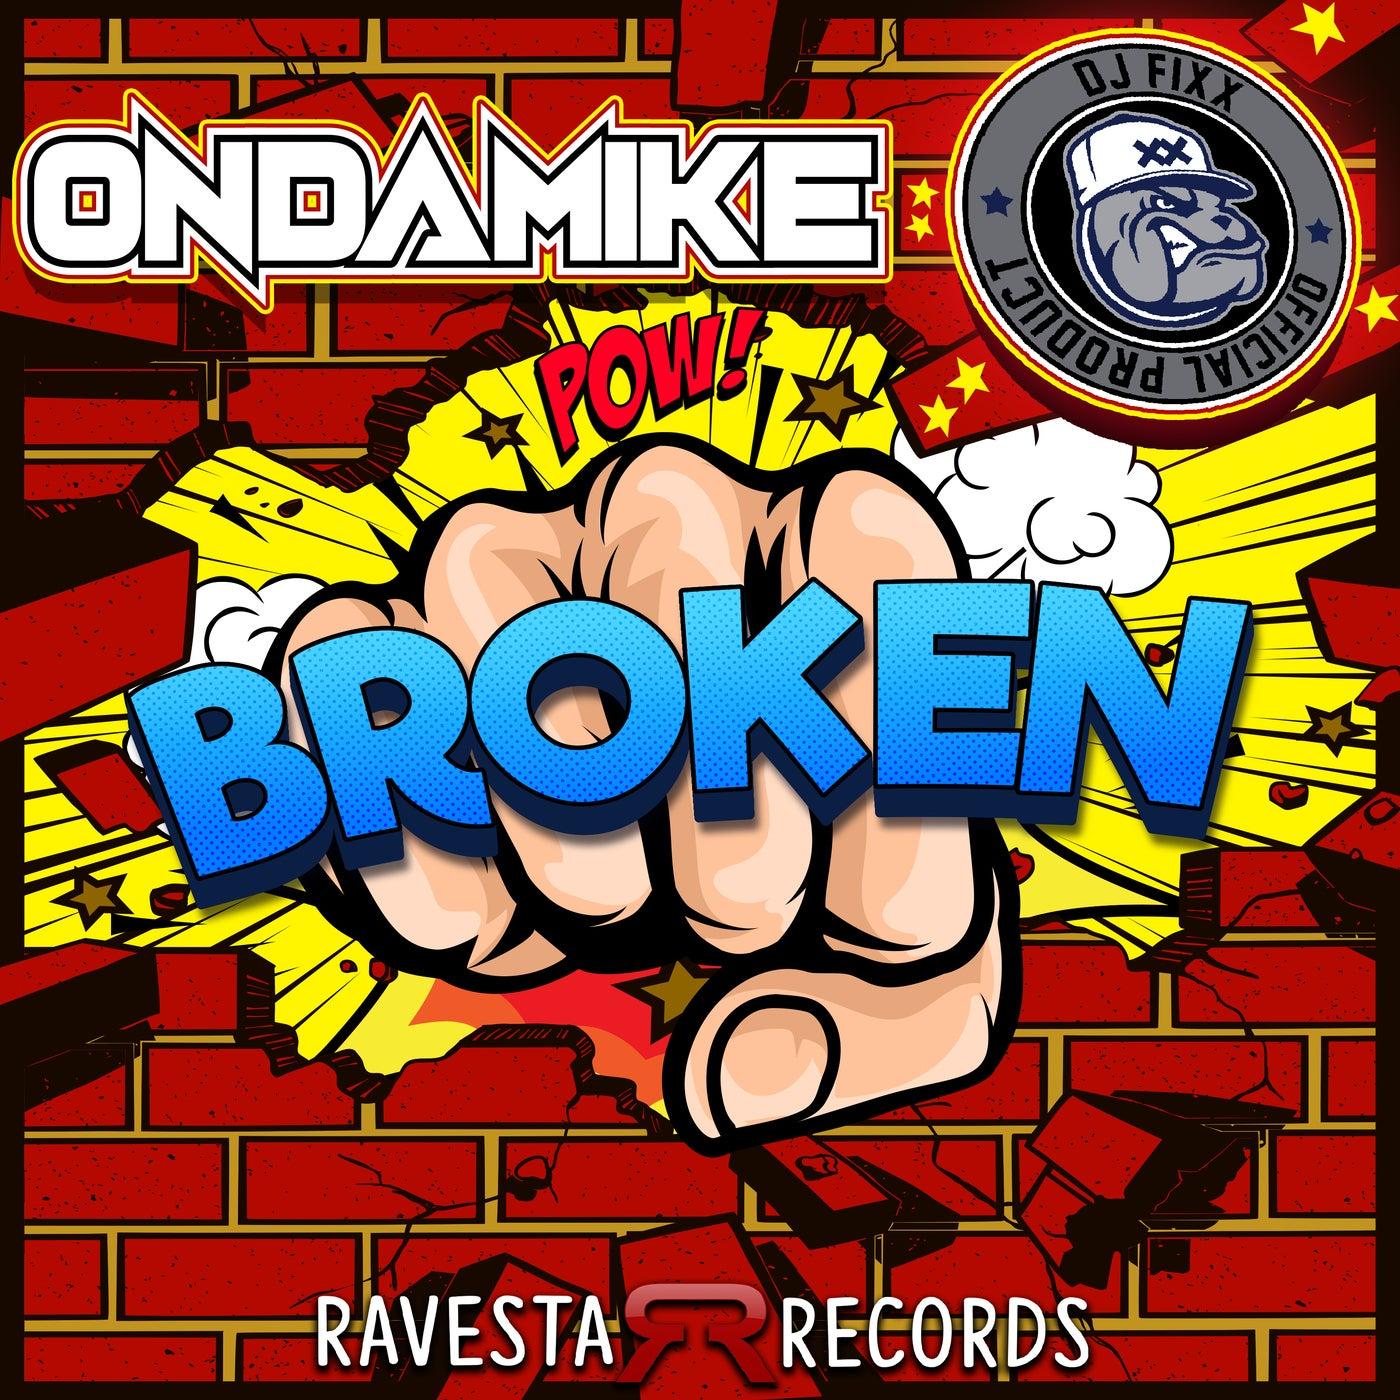 Broken (Original Mix)